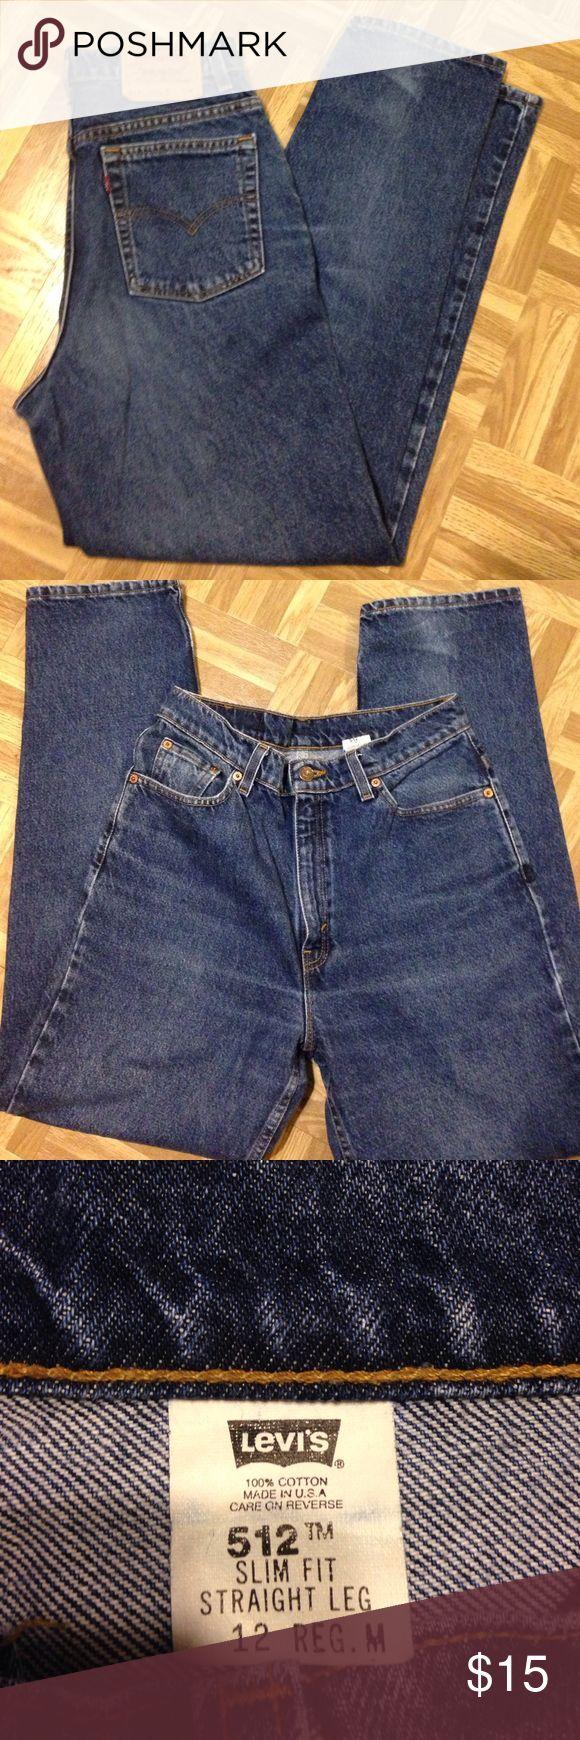 Levi 512 women's jeans Sz 12 Levi 512 women's jeans Sz 12 Reg M. Slim fit. Straight leg. Great condition. Levi's Jeans Straight Leg